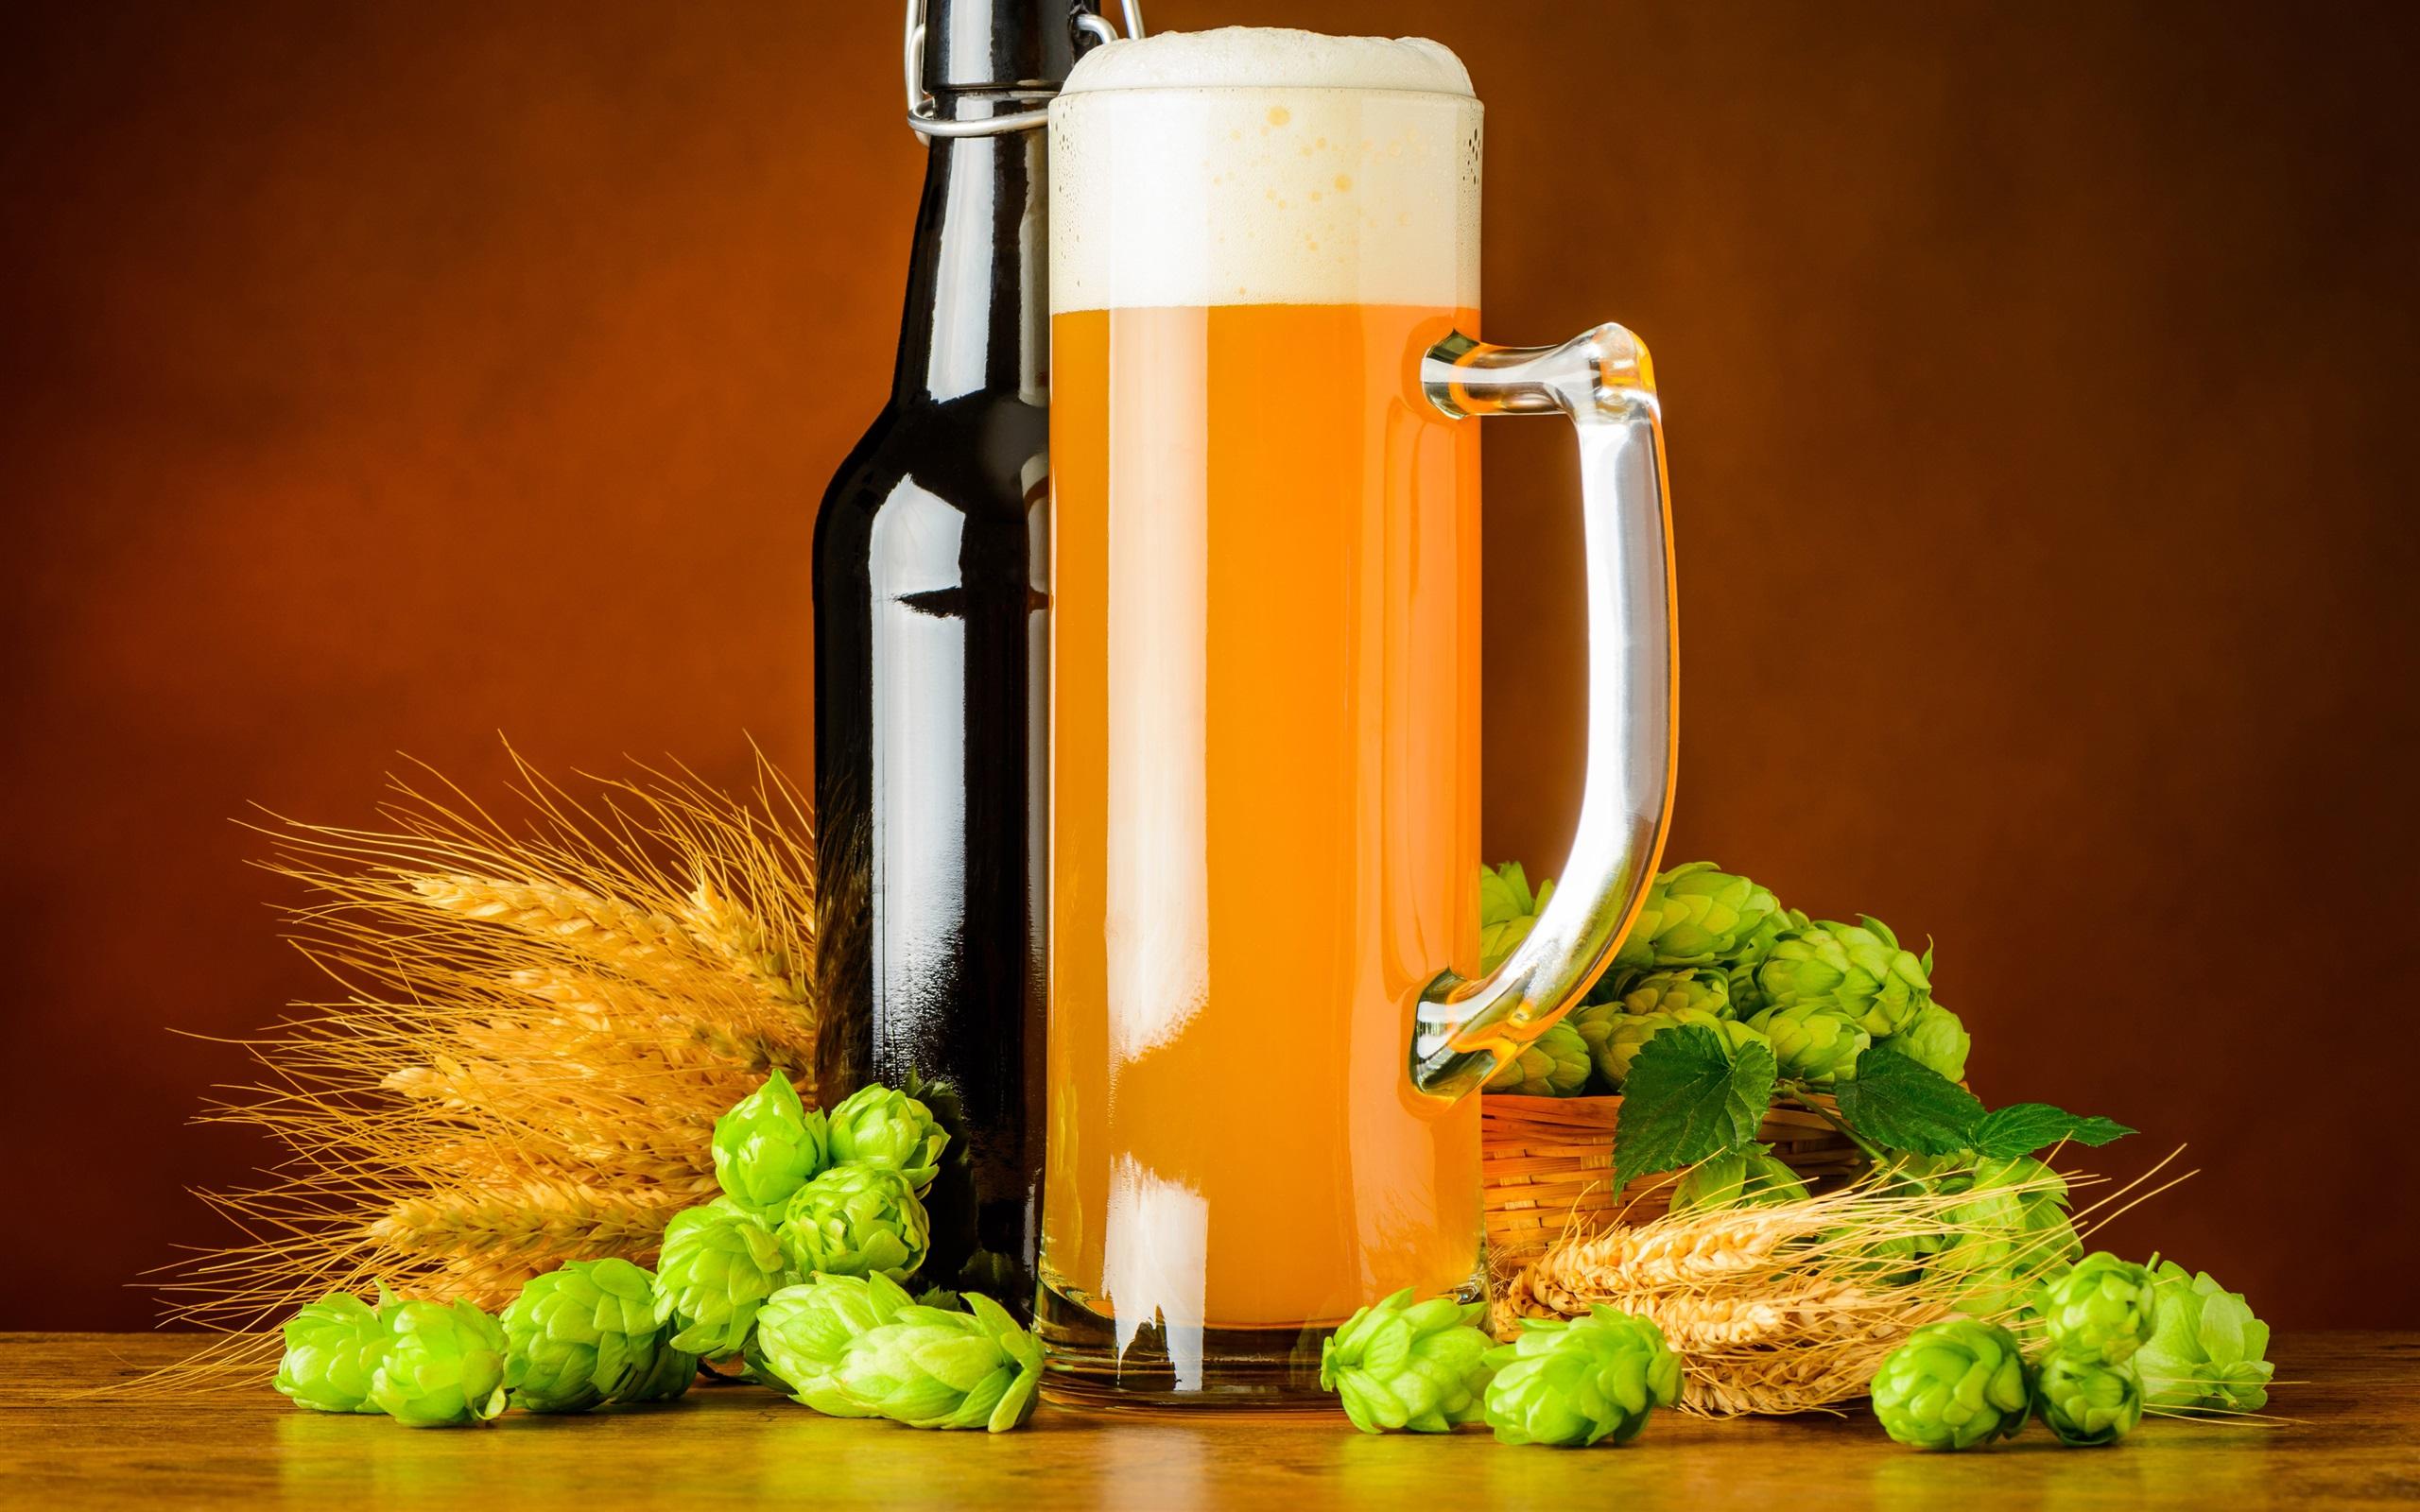 Wallpaper Bottle Hops Beer Mug 3840x2160 Uhd 4k Picture